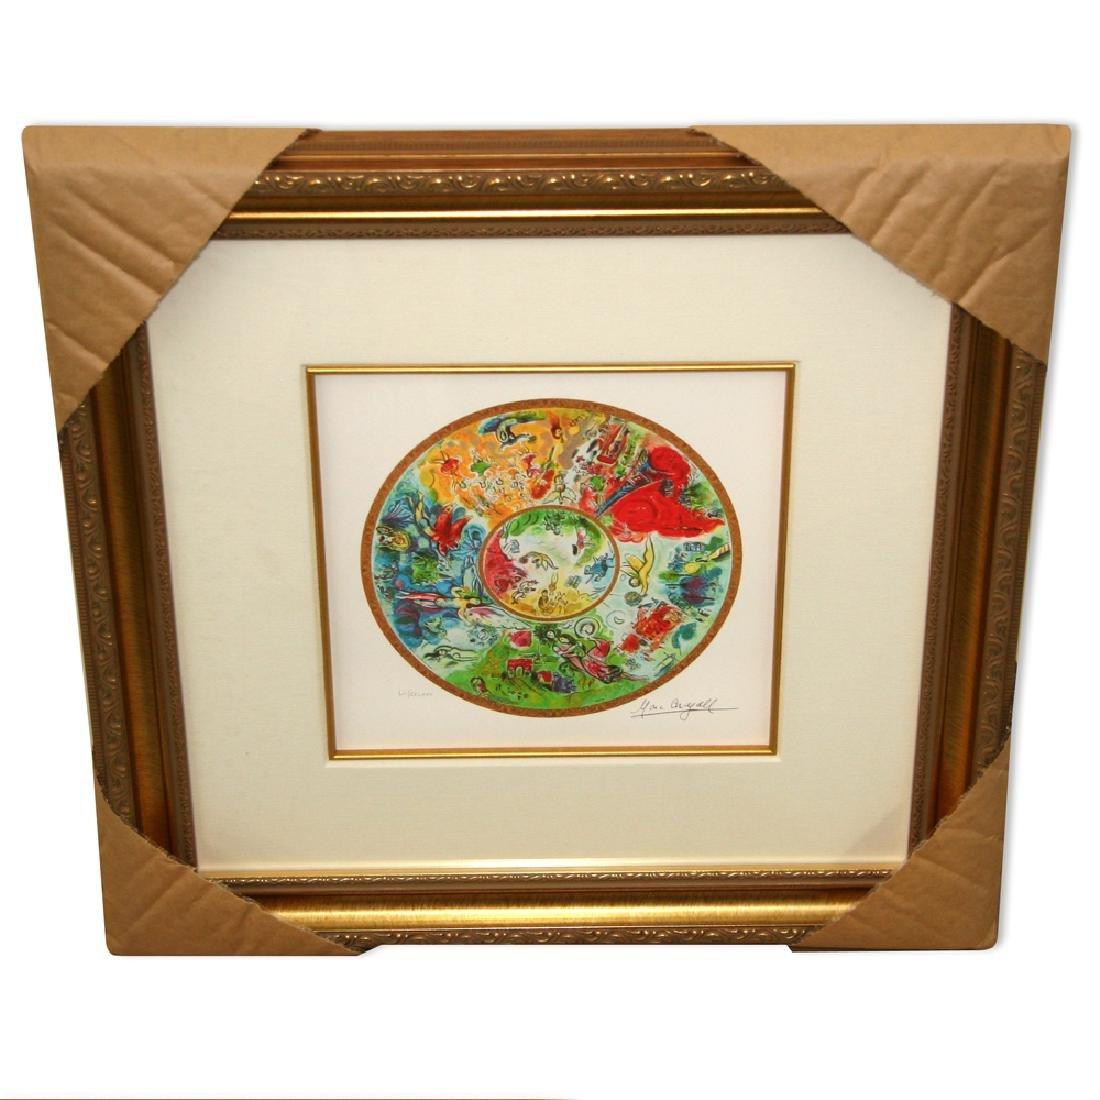 Chagall (After) 'Paris Opera Ceiling' Framed Giclee-Ltd